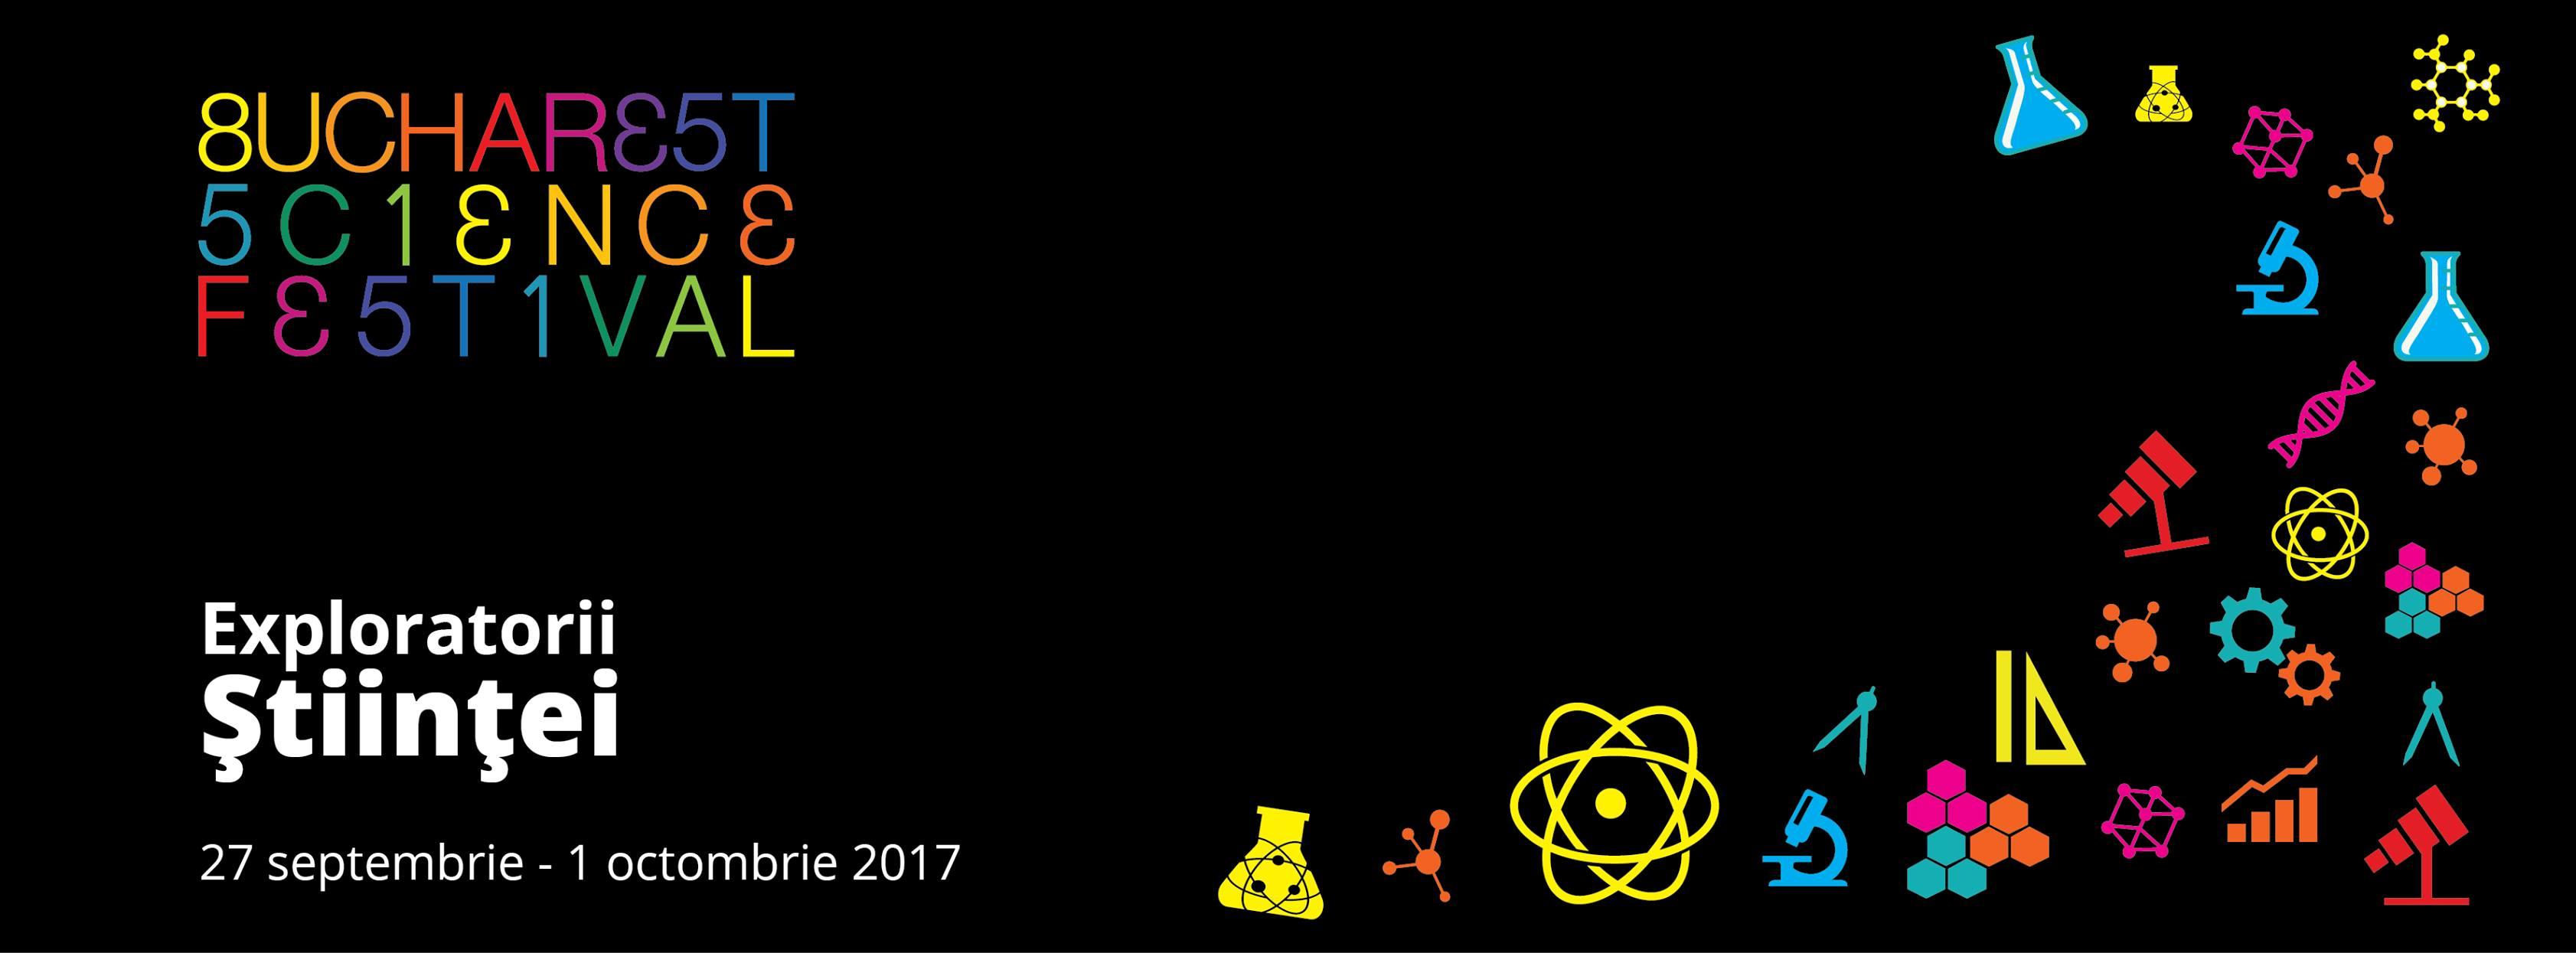 Bucharest Science Festival 2017